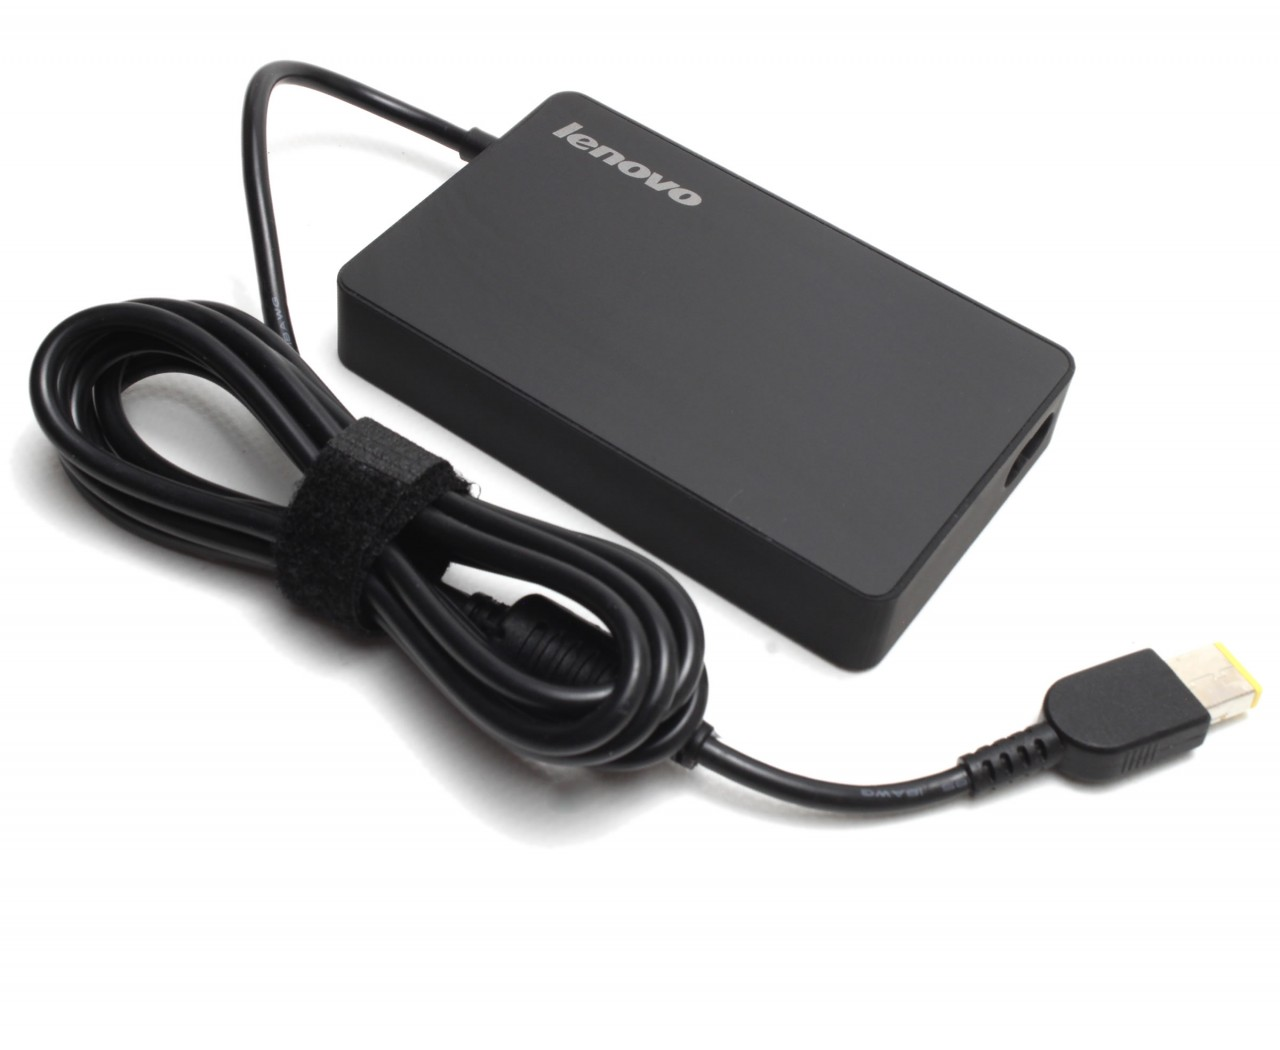 Incarcator Lenovo ThinkPad Edge E531 6887 65W Slim Version imagine